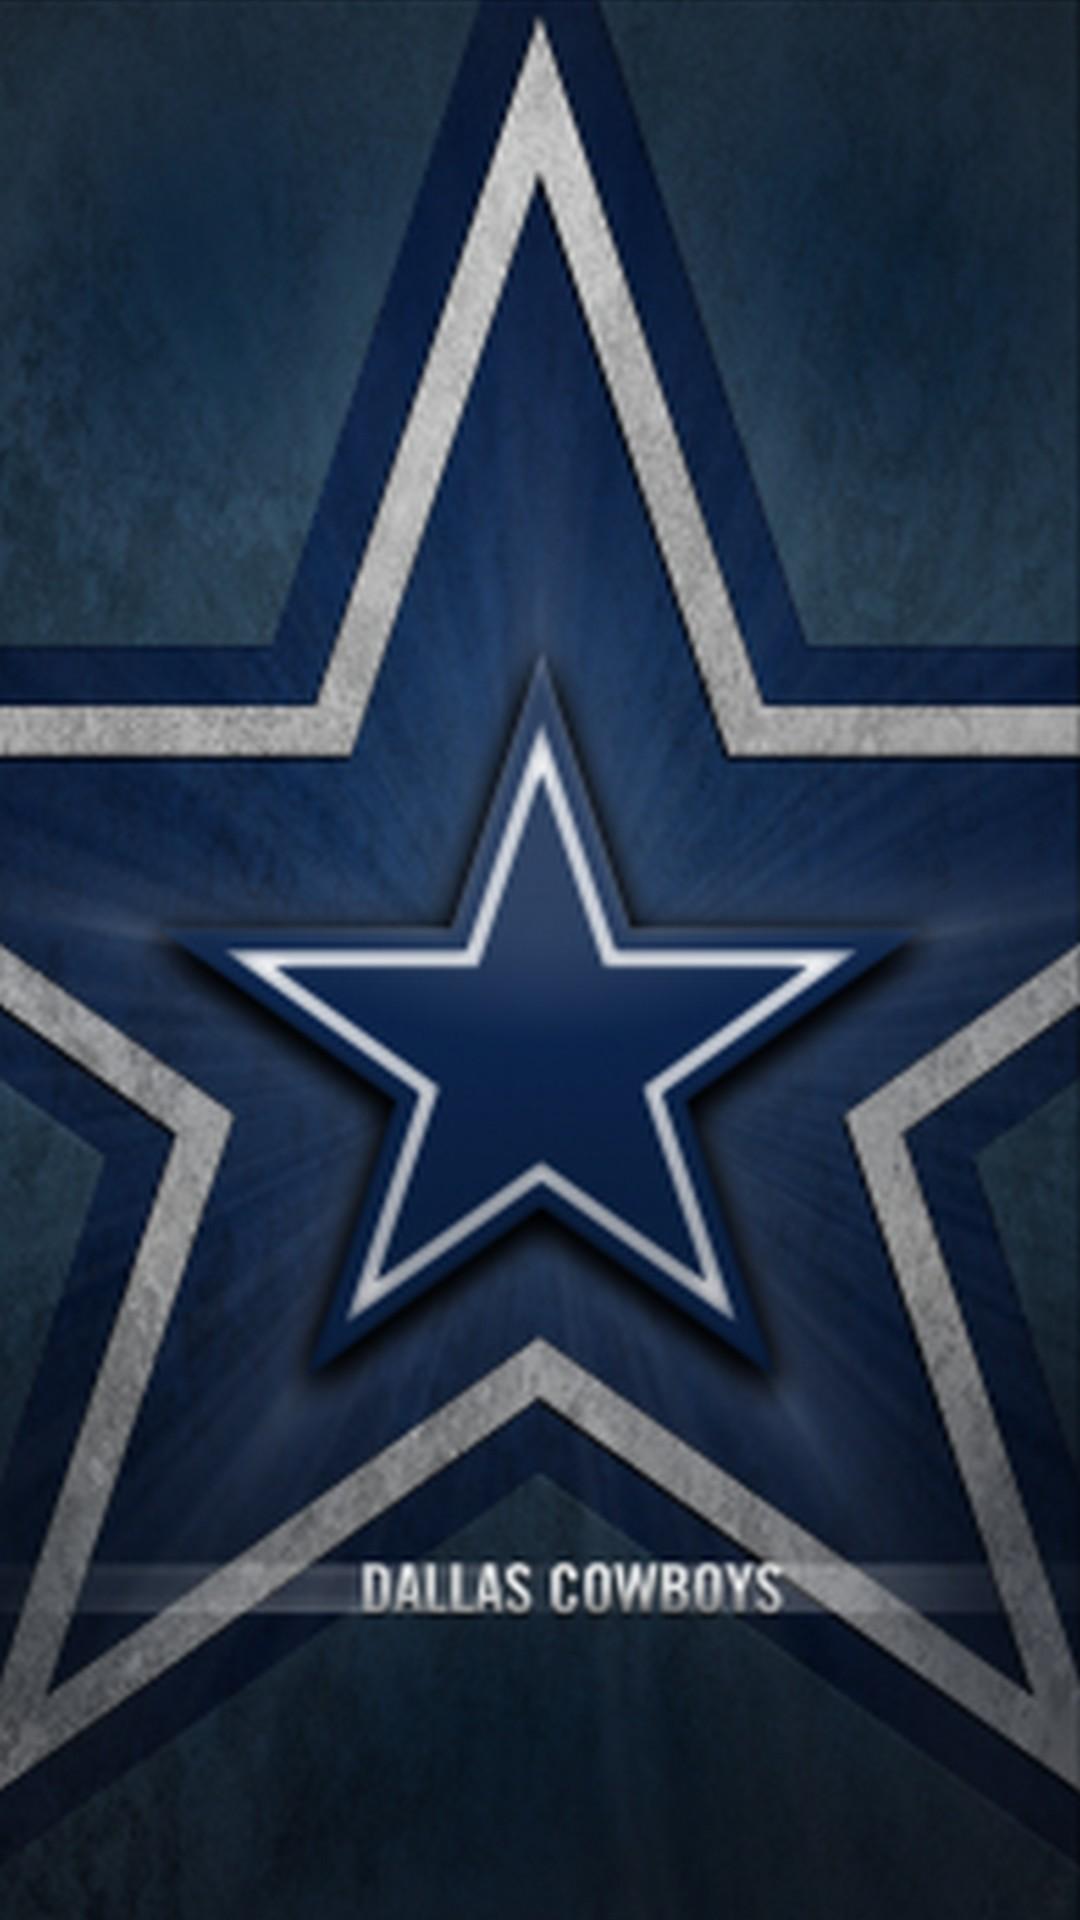 Dallas Cowboys Iphone Xs Wallpaper With High-resolution - Heineken Red Star - HD Wallpaper